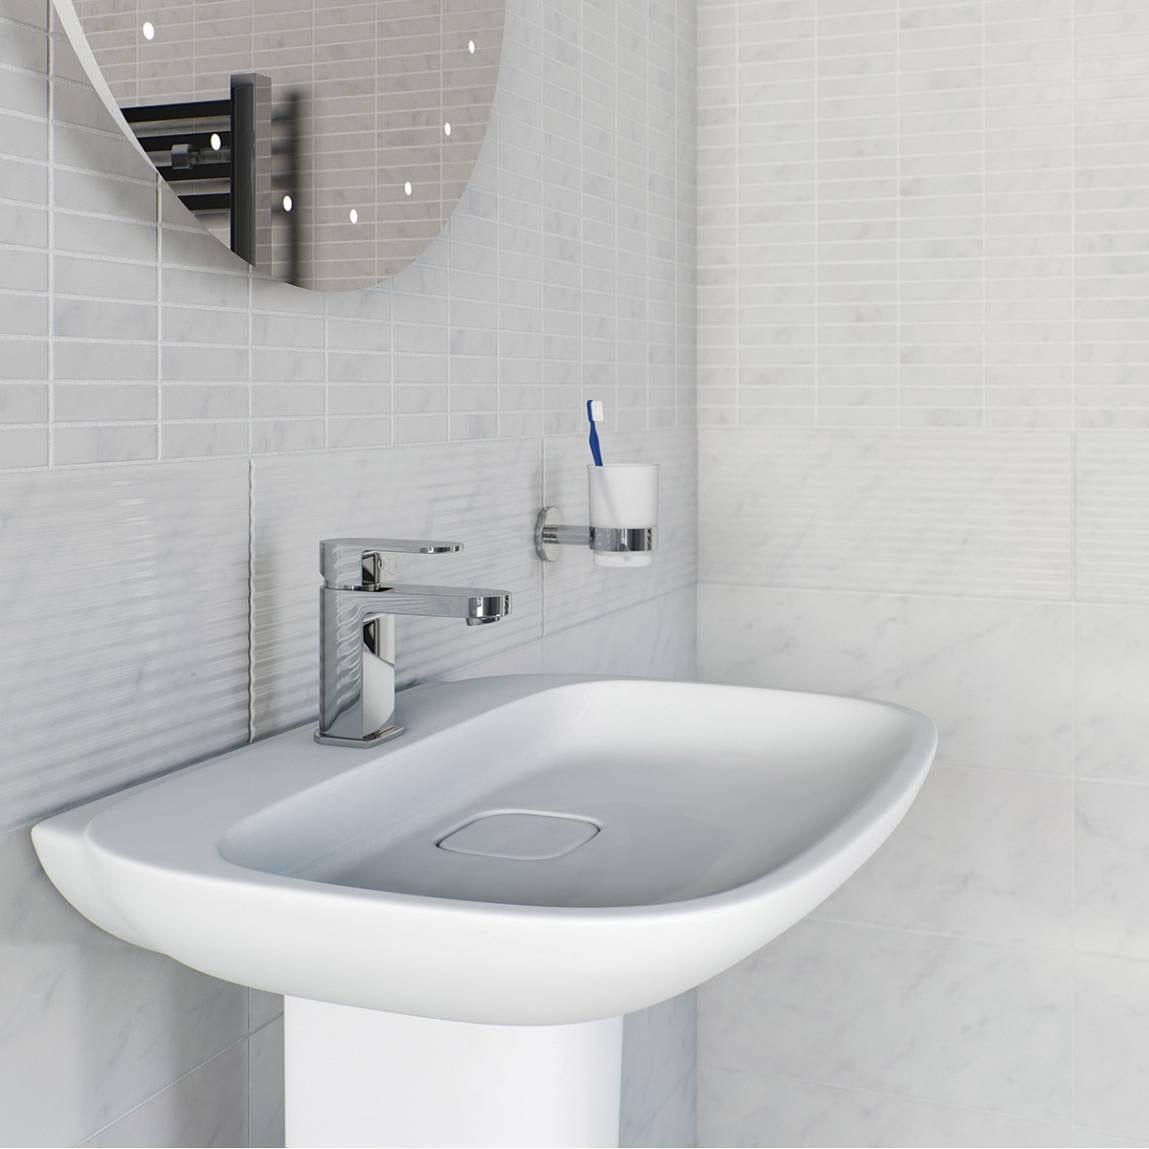 Exelent How To Choose Bathroom Tiles Sketch - Bathroom Design Ideas ...